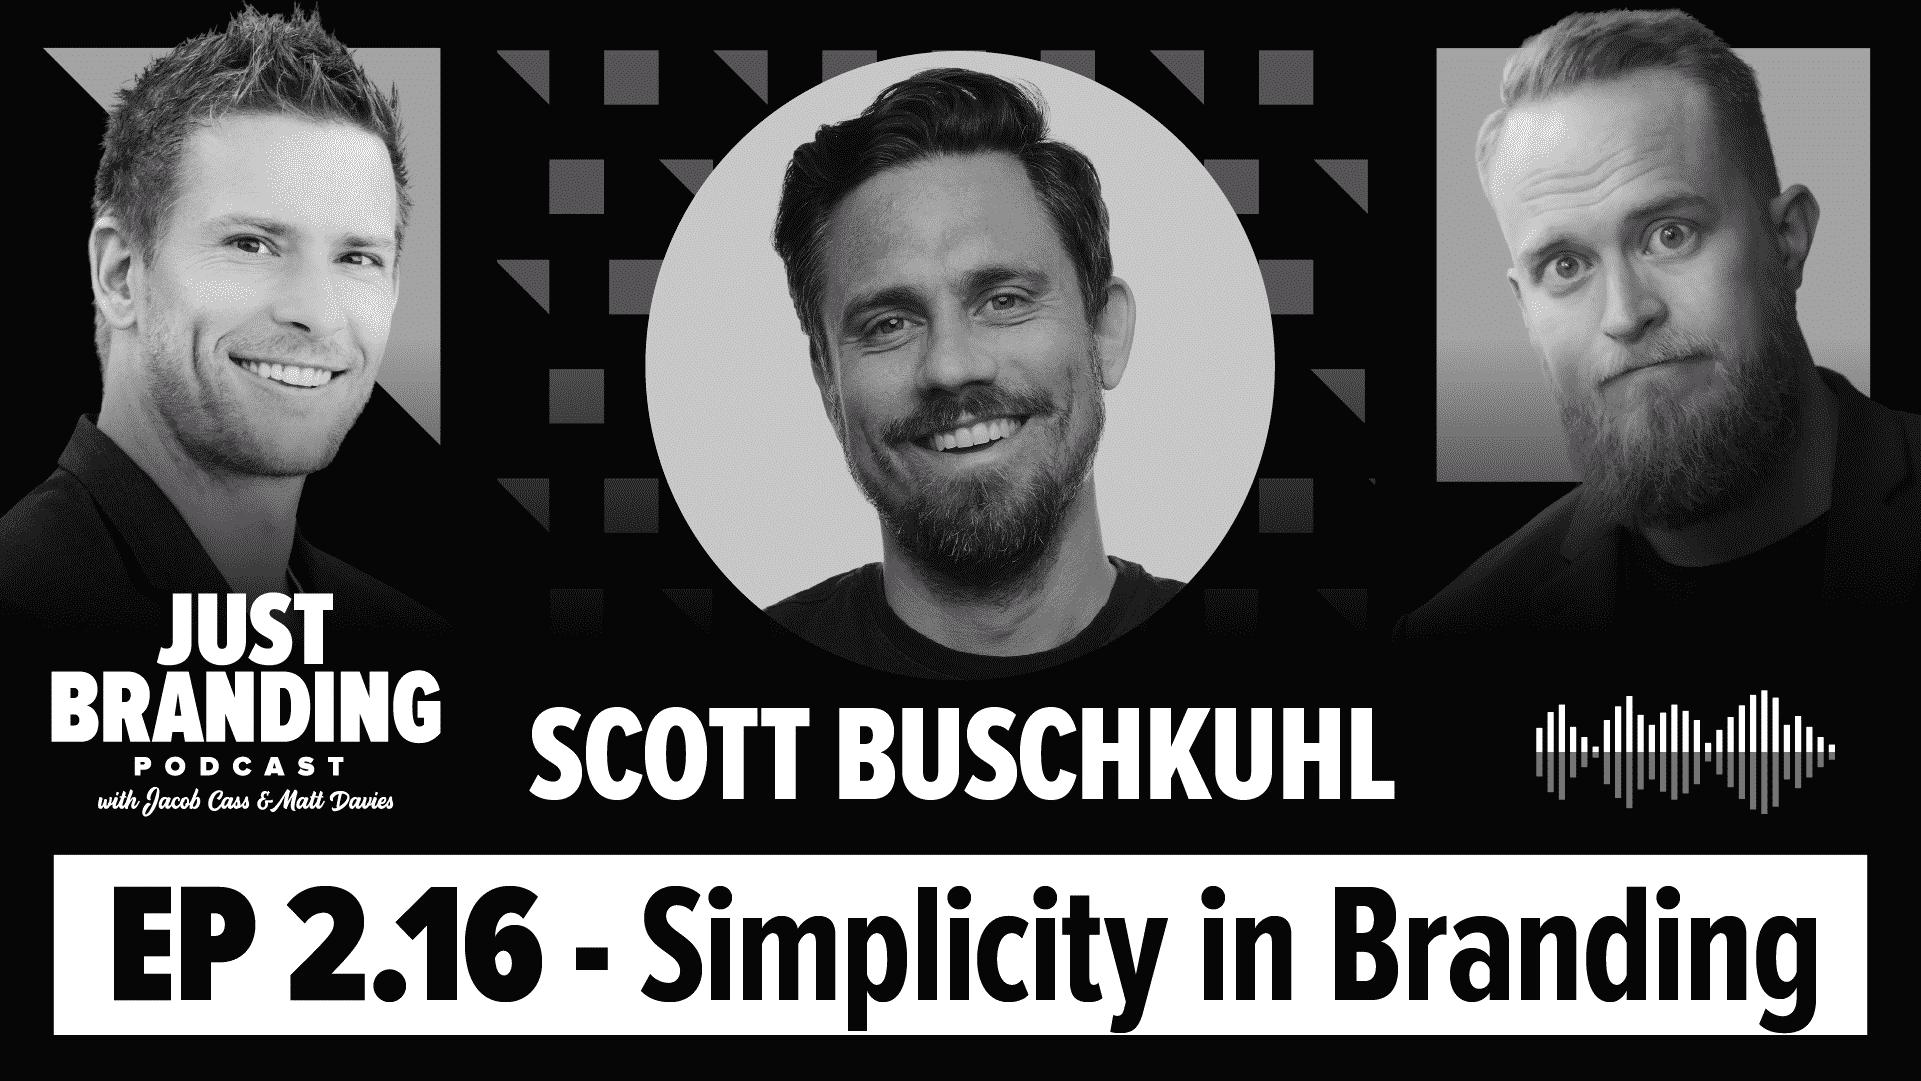 Simplicity in Branding with Scott Buschkuhl